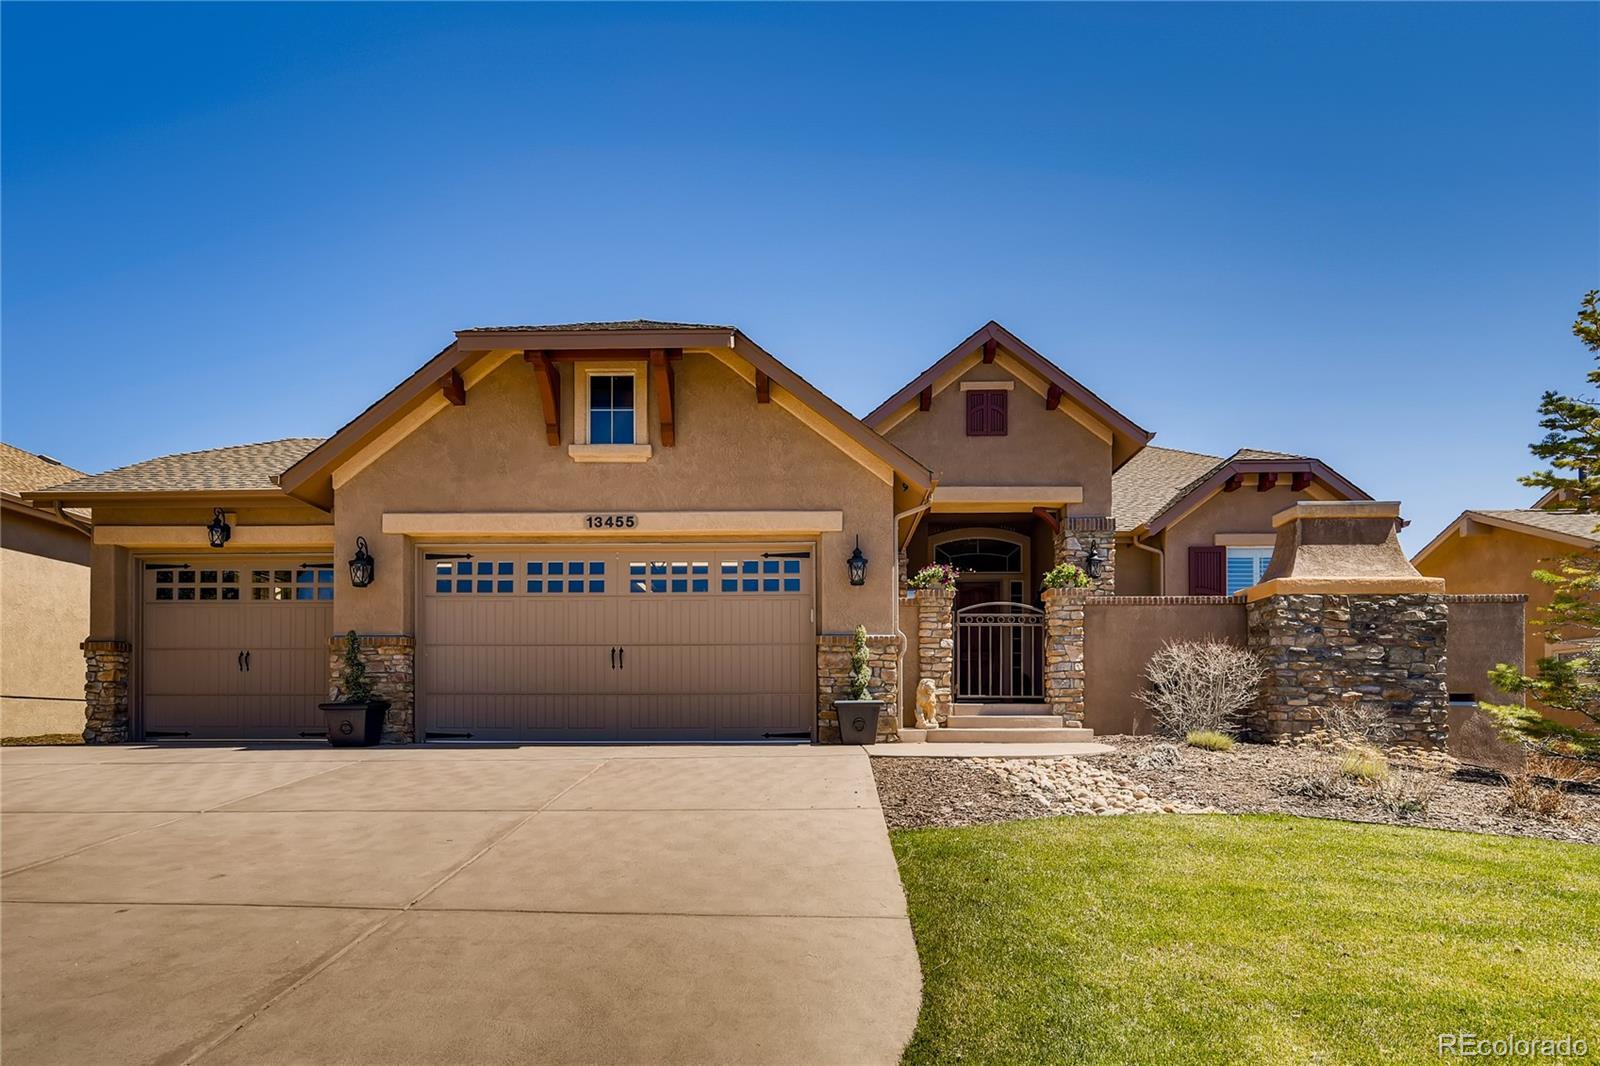 13455 Cedarville Way Property Photo - Colorado Springs, CO real estate listing